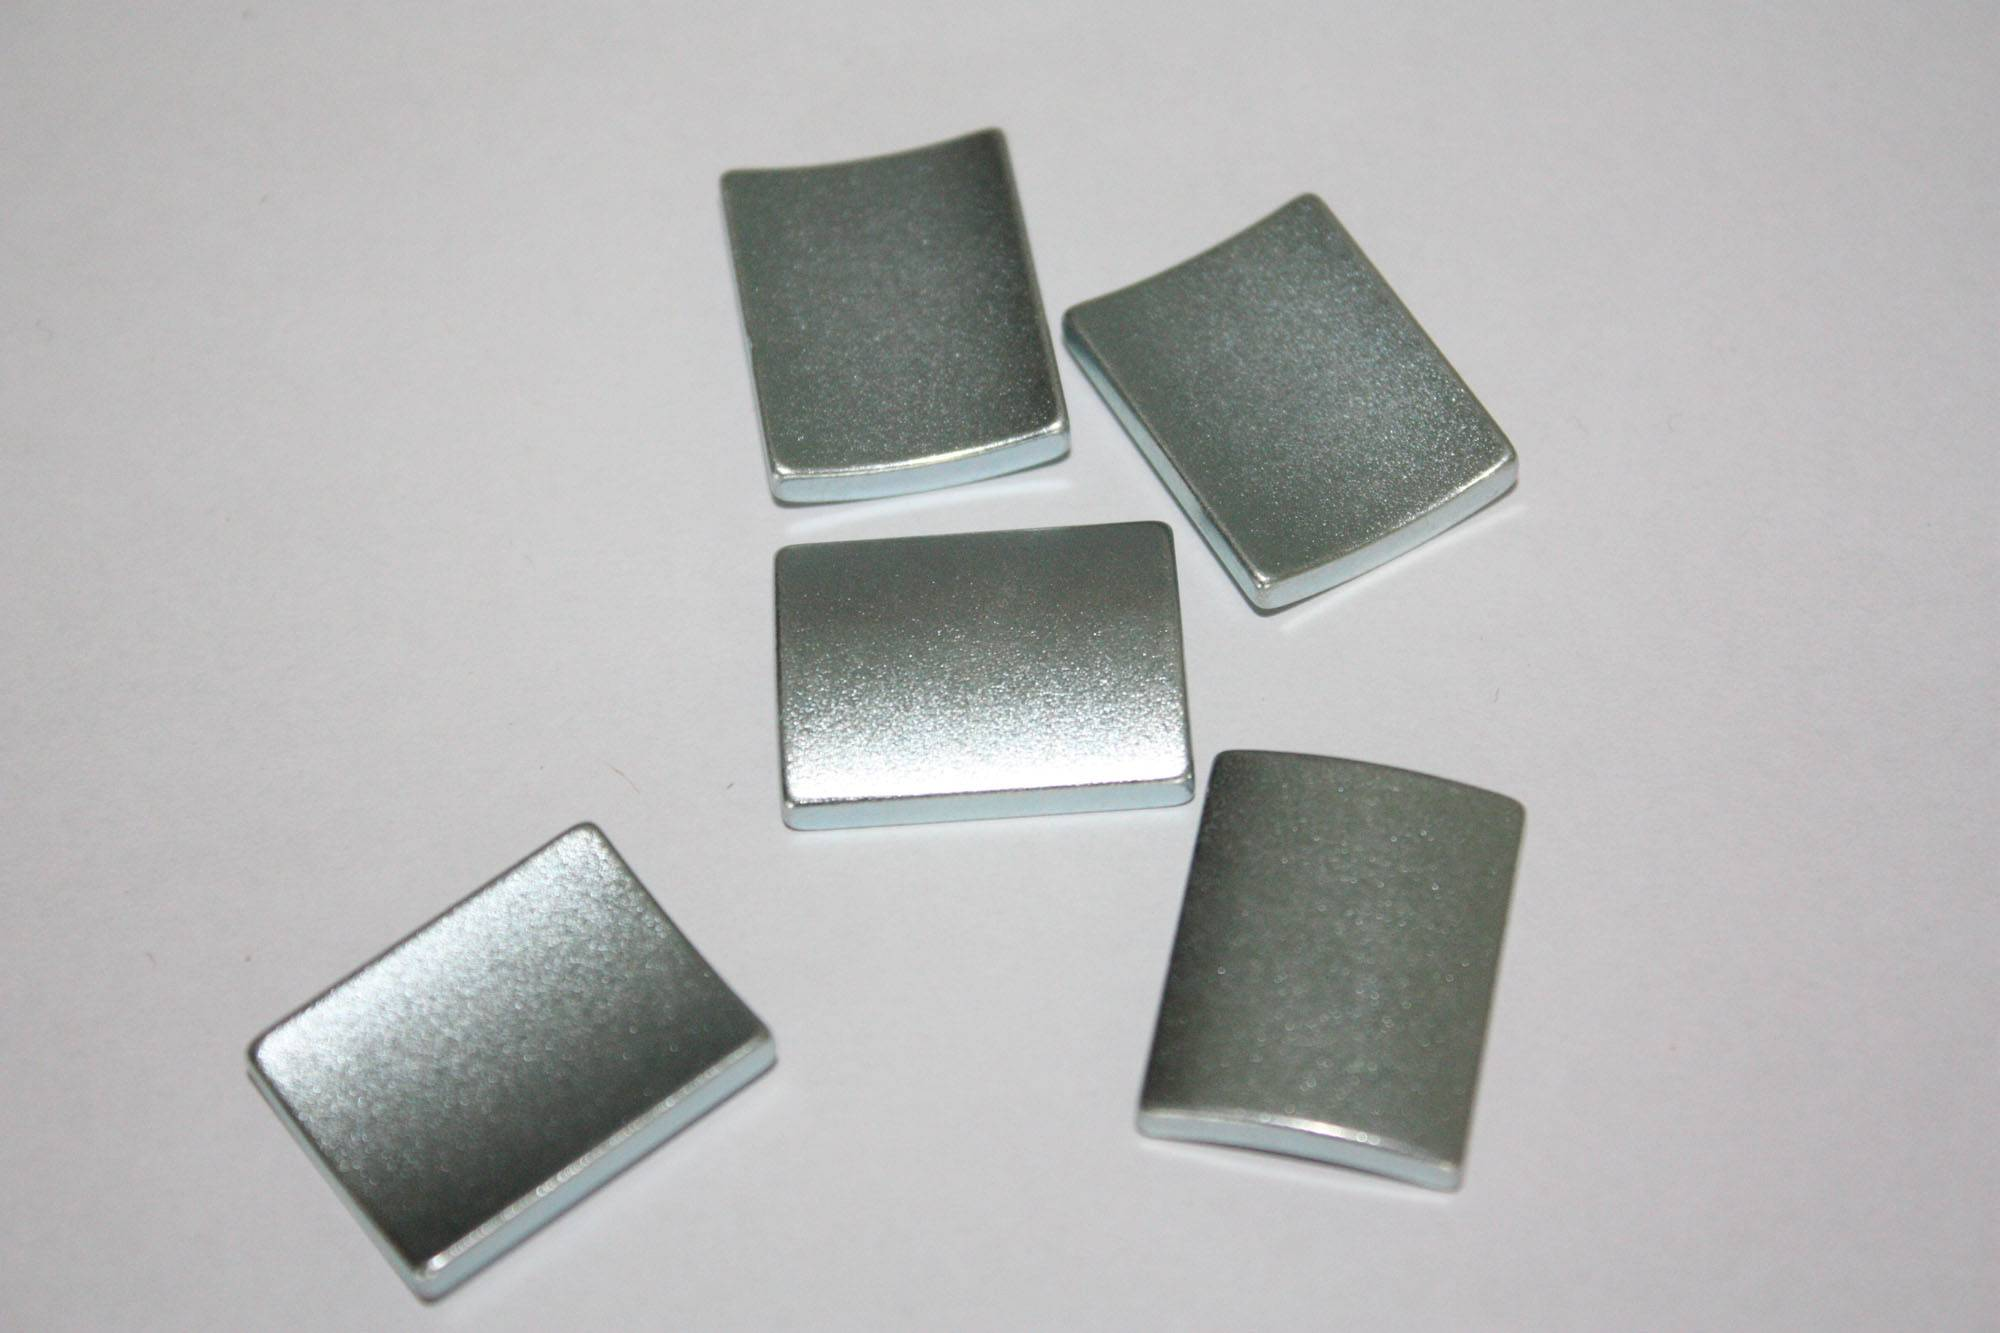 fridge magnets/NdFeB magnets permanent magnents